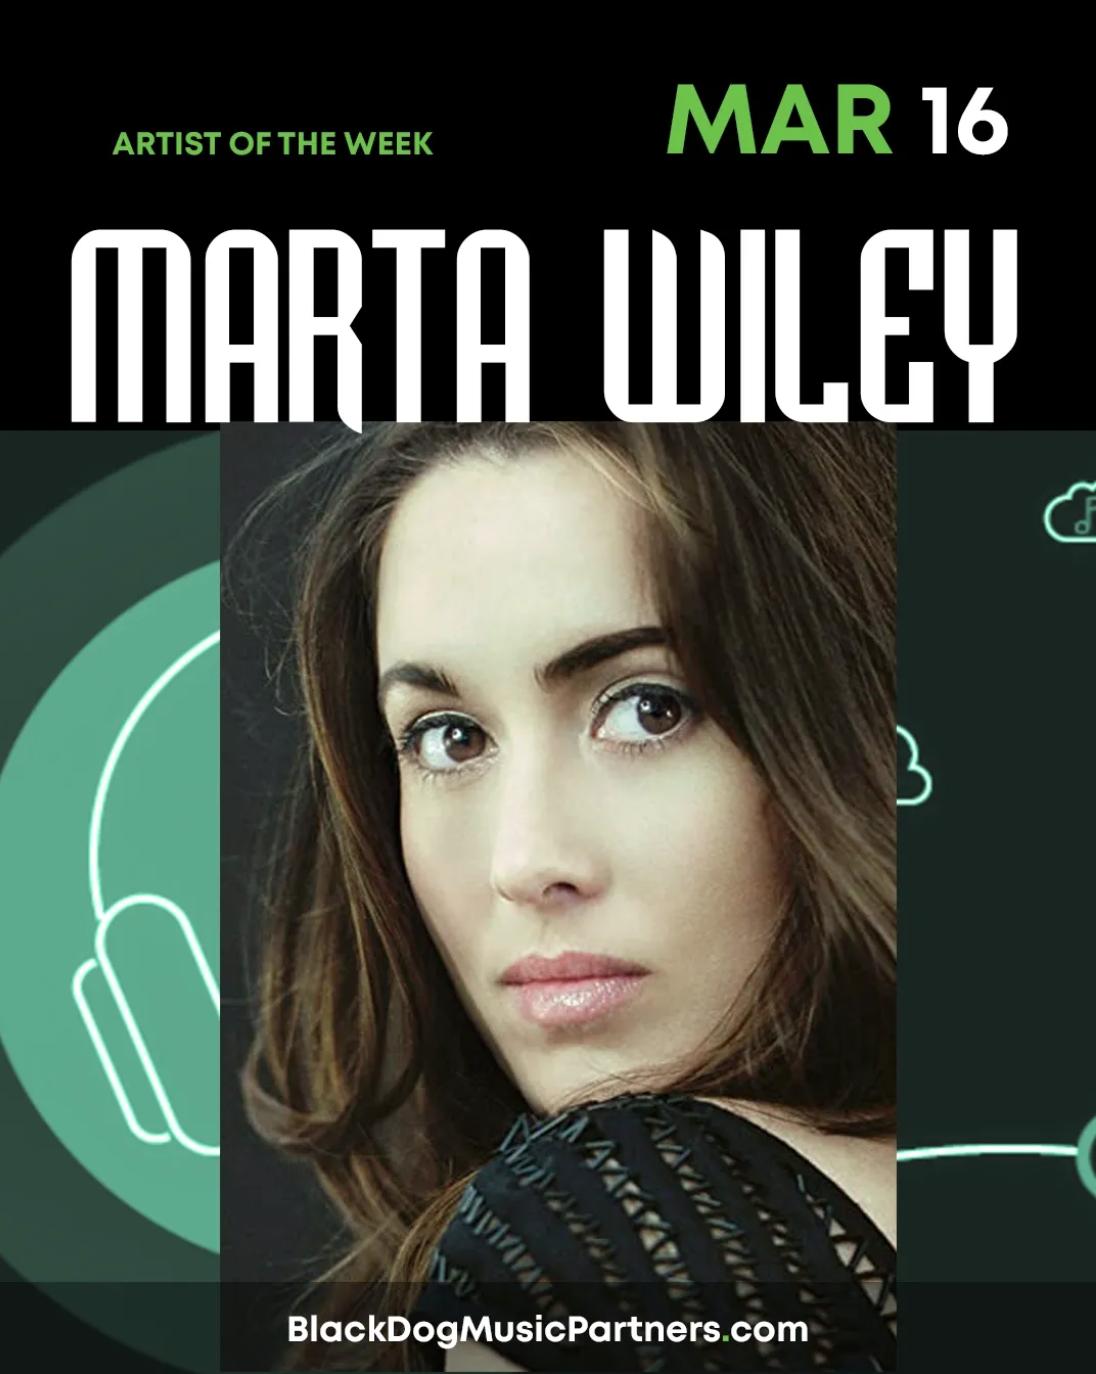 Artist Of The Week: Marta Wiley